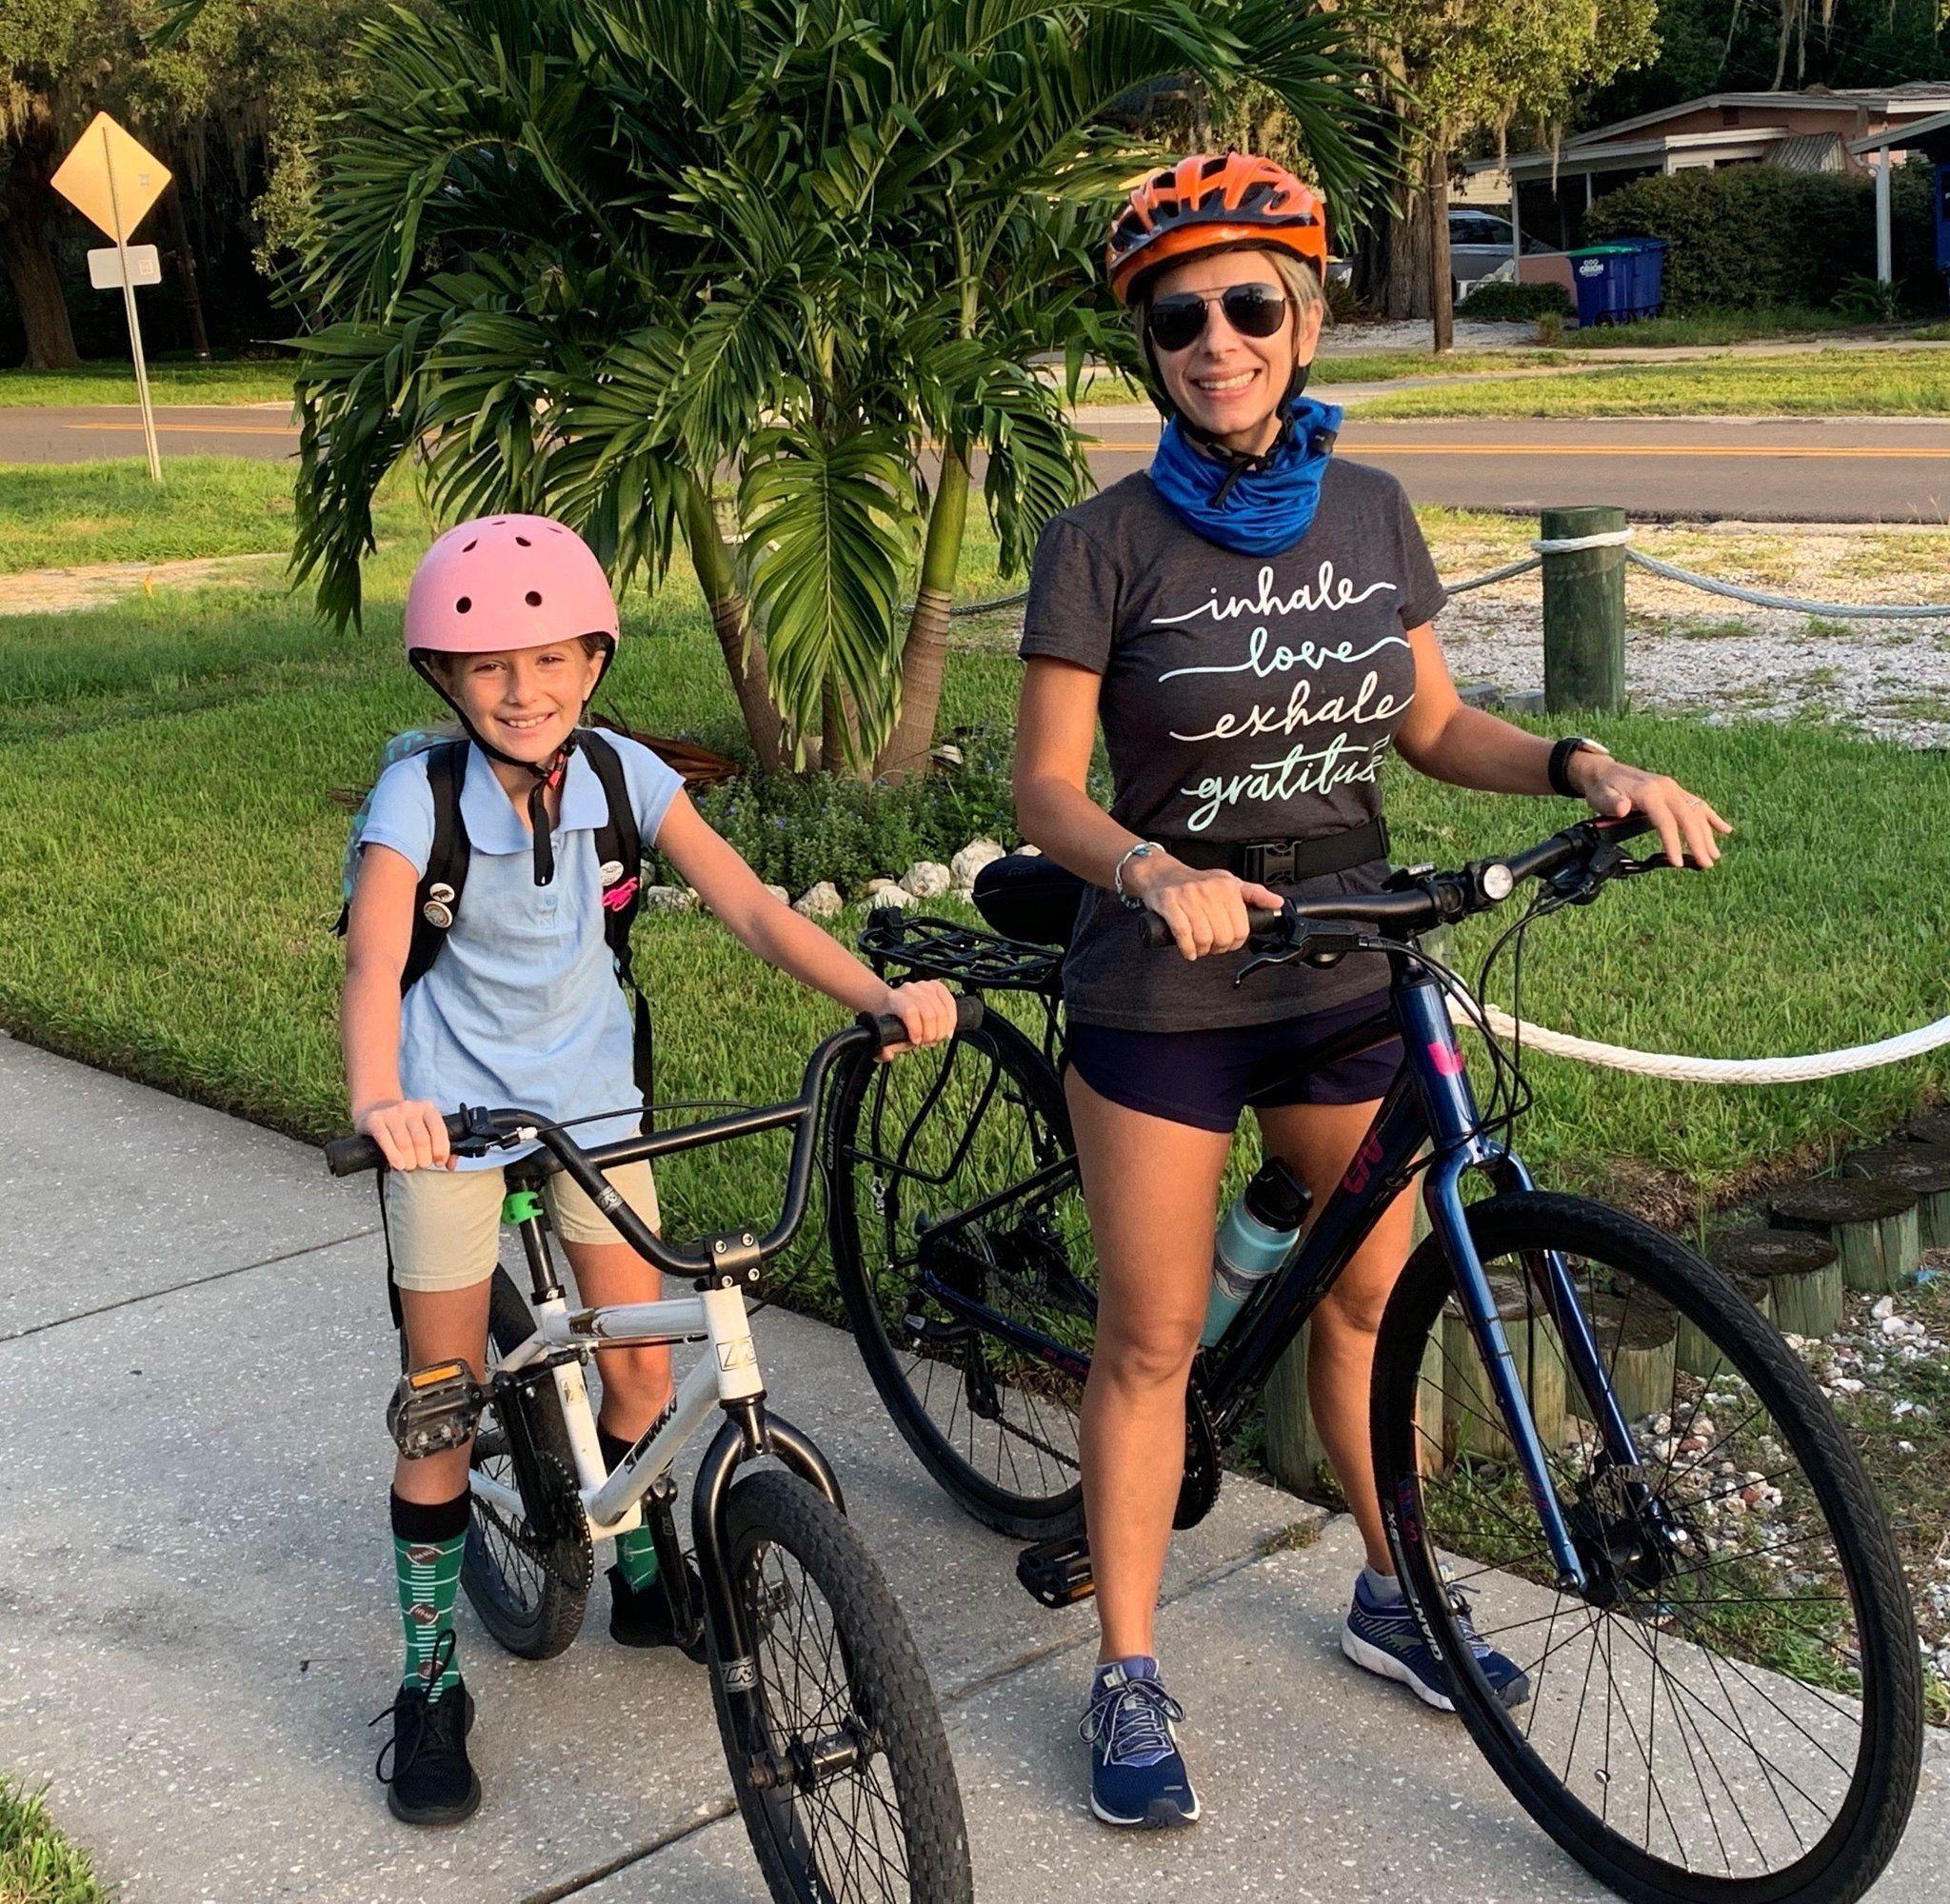 Angela and child on bikes